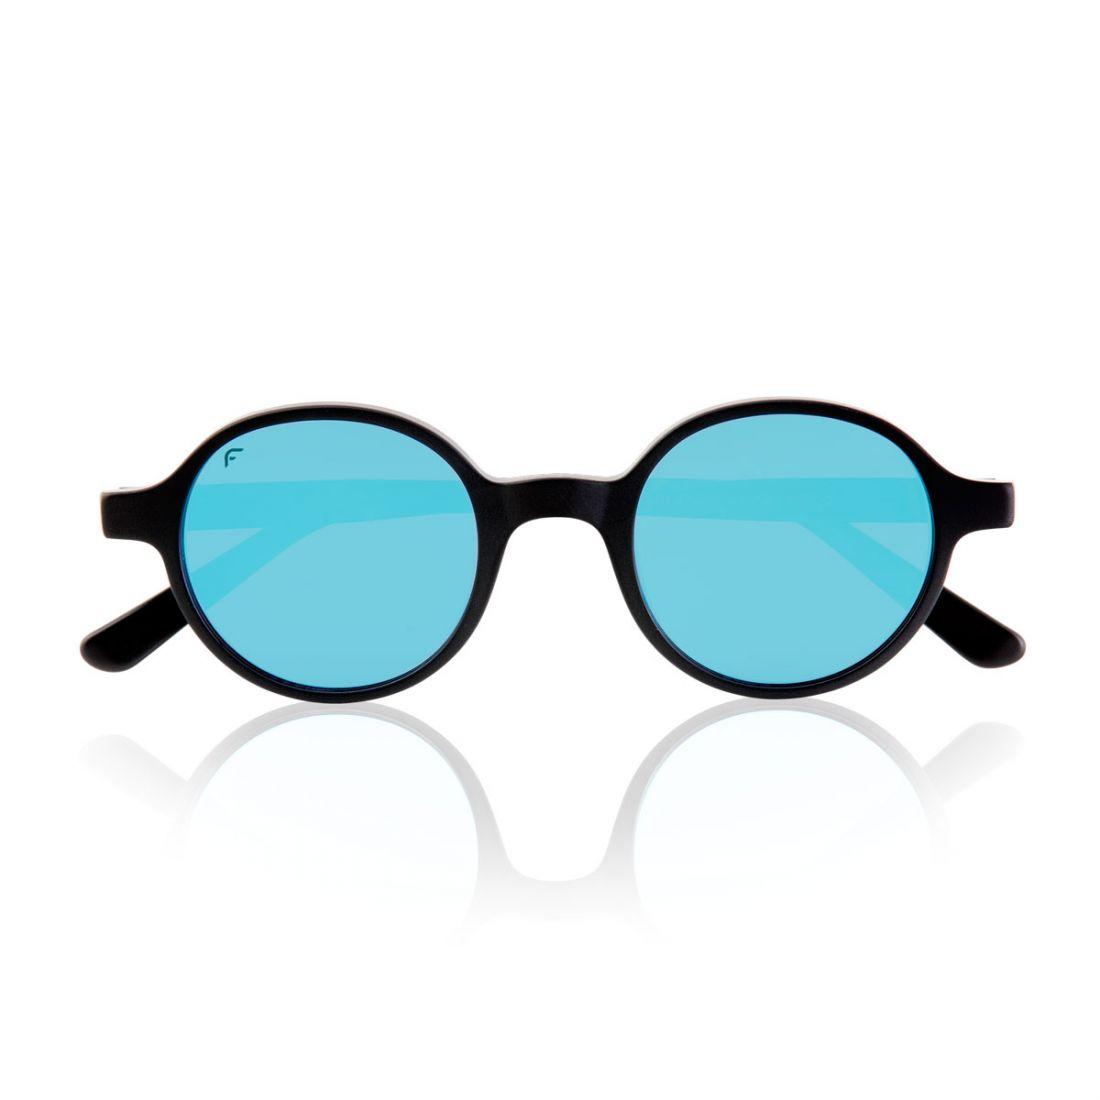 Handmade Finished Acetate Glasses Frame For